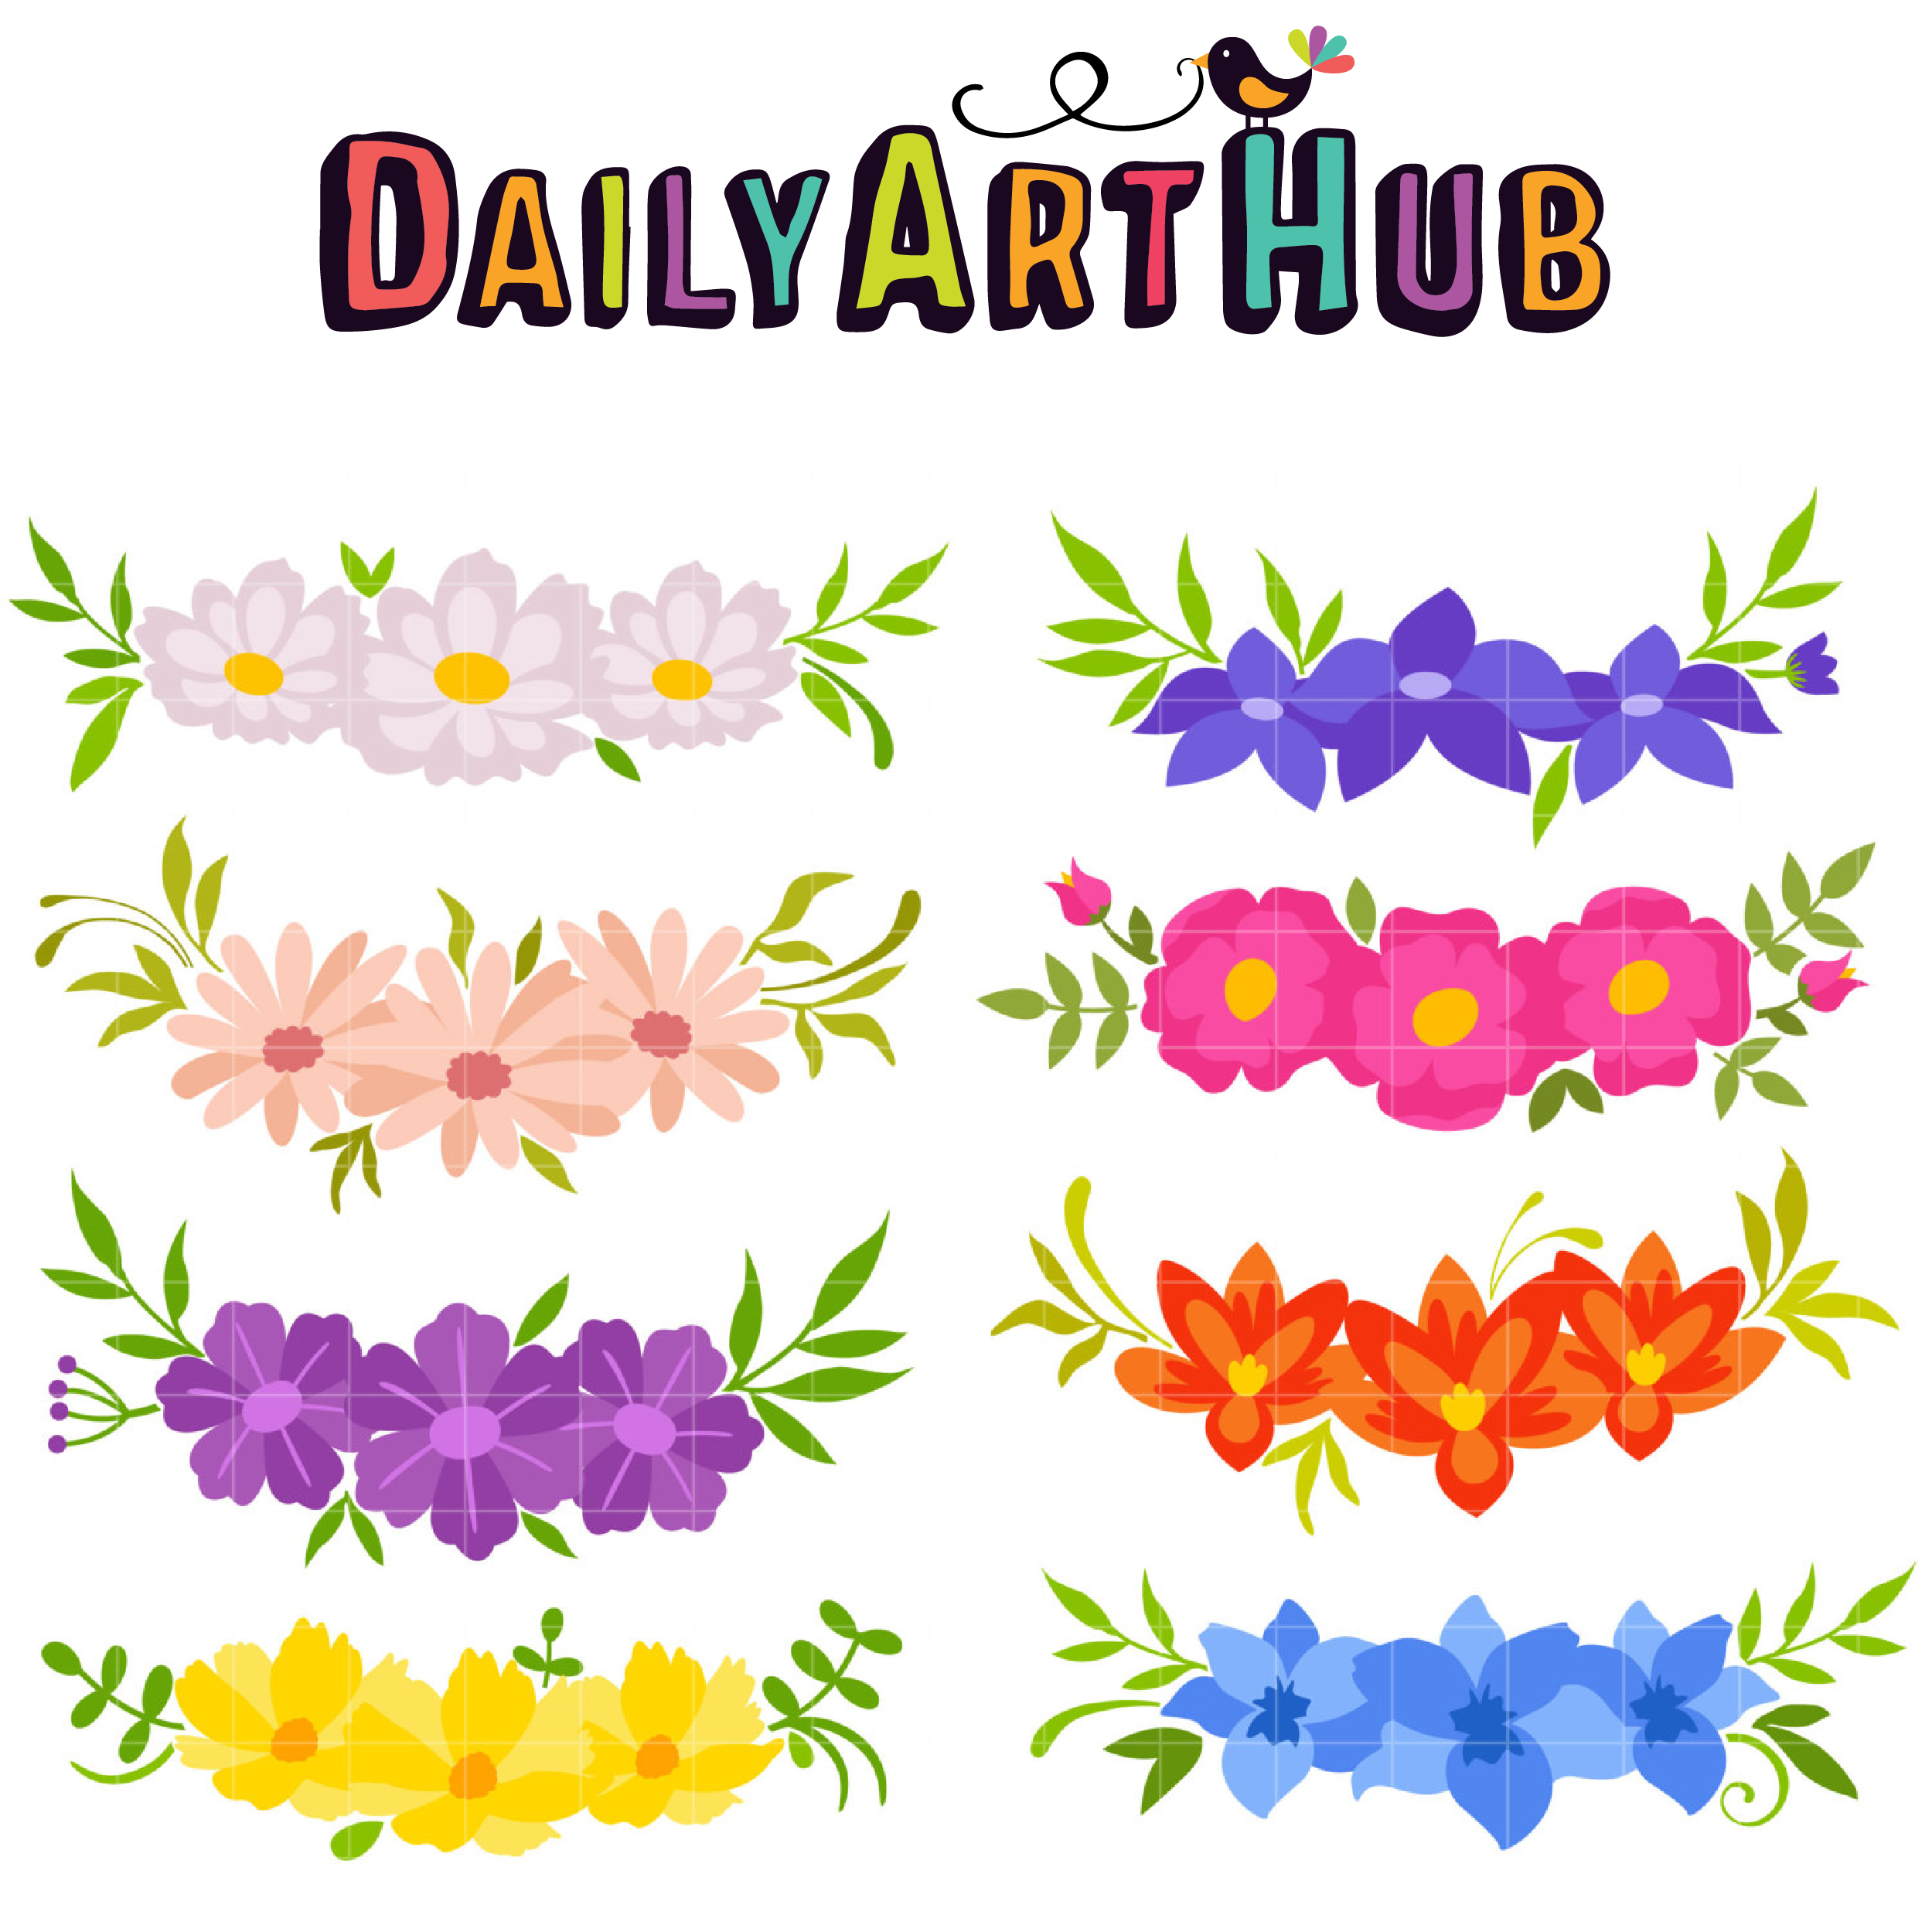 Flower Crowns Clip Art Set Daily Art Hub Free Clip Art Everyday